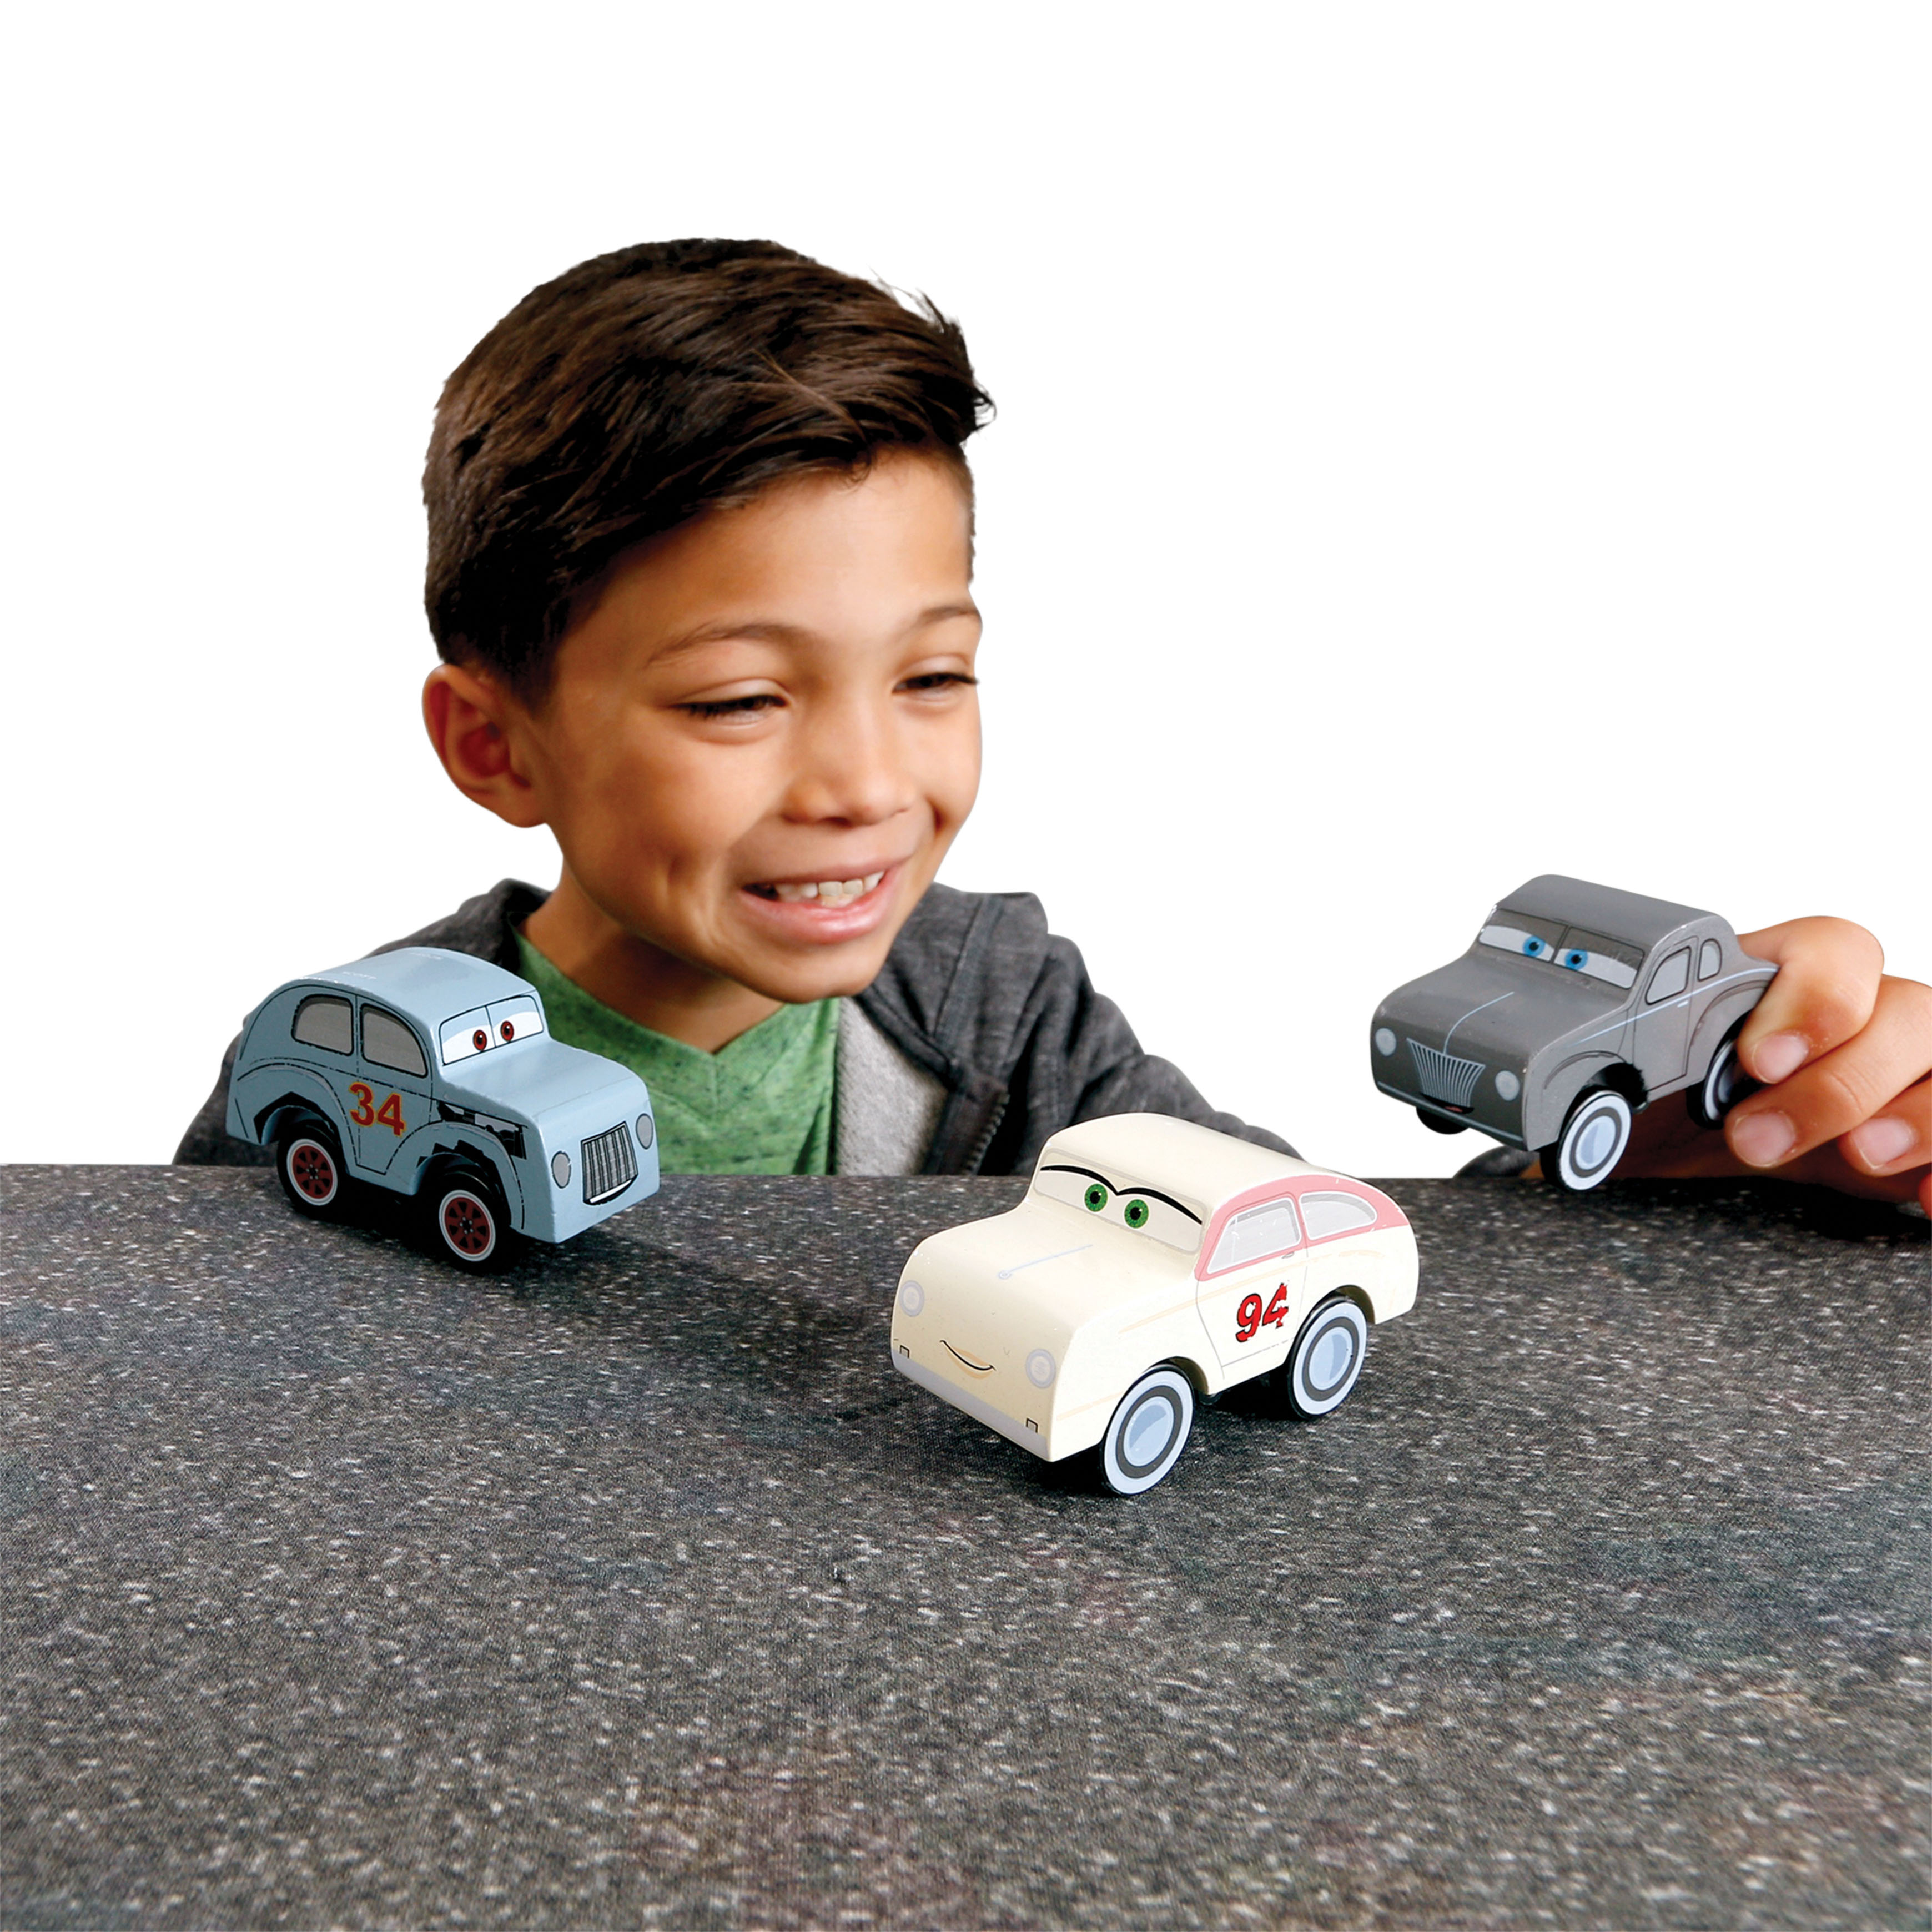 KidKraft Disney Pixar Cars 3 3-Pack Thomasville by KidKraft